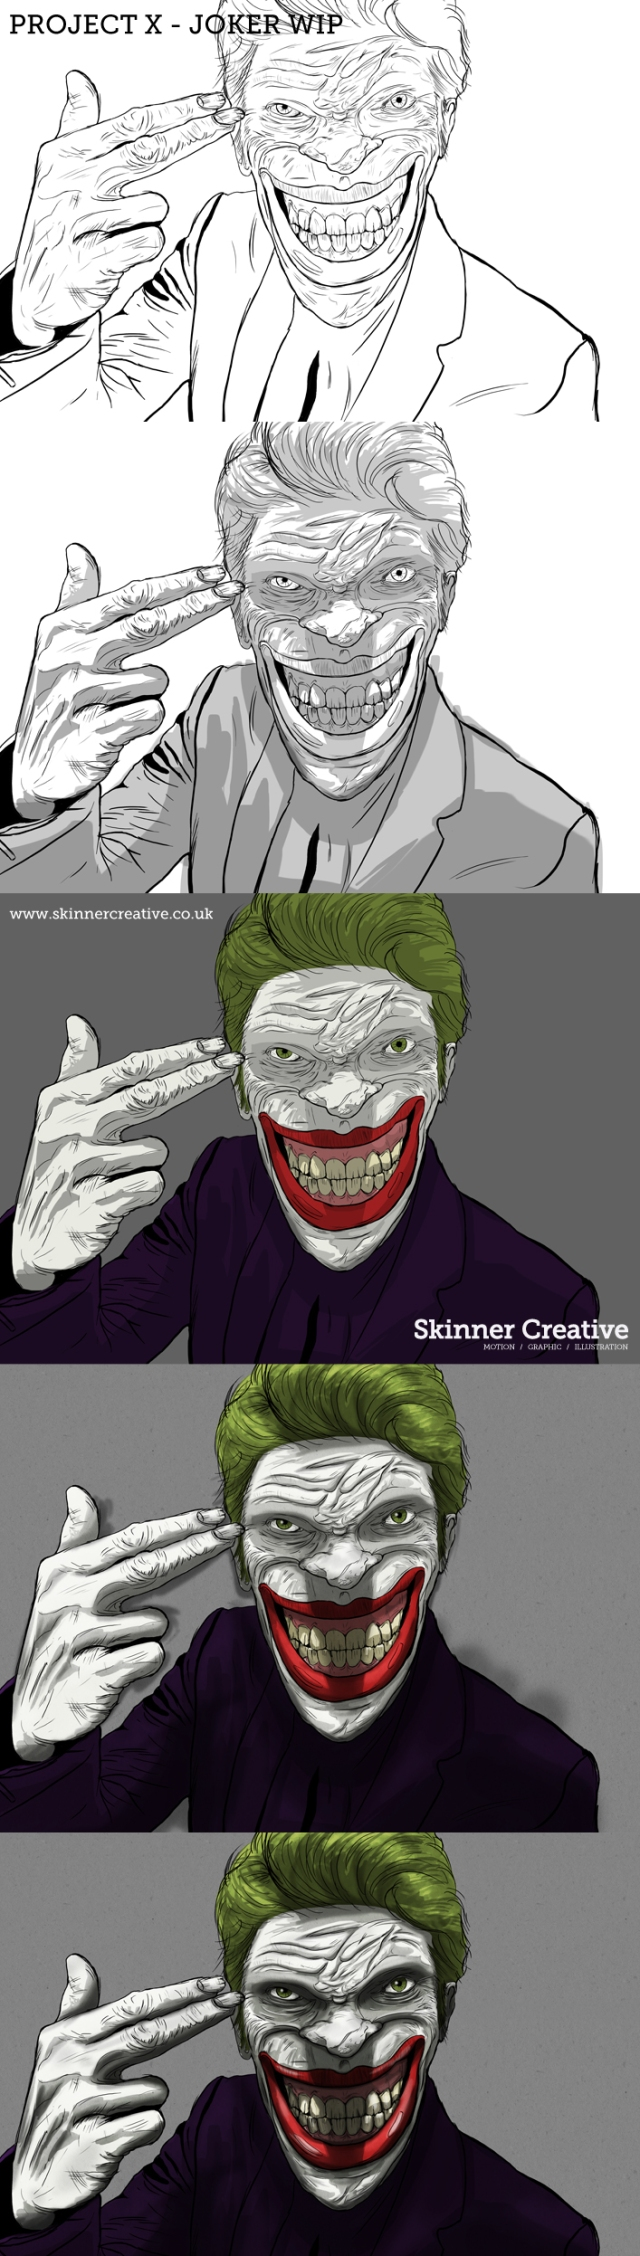 Joker-WIP-stages